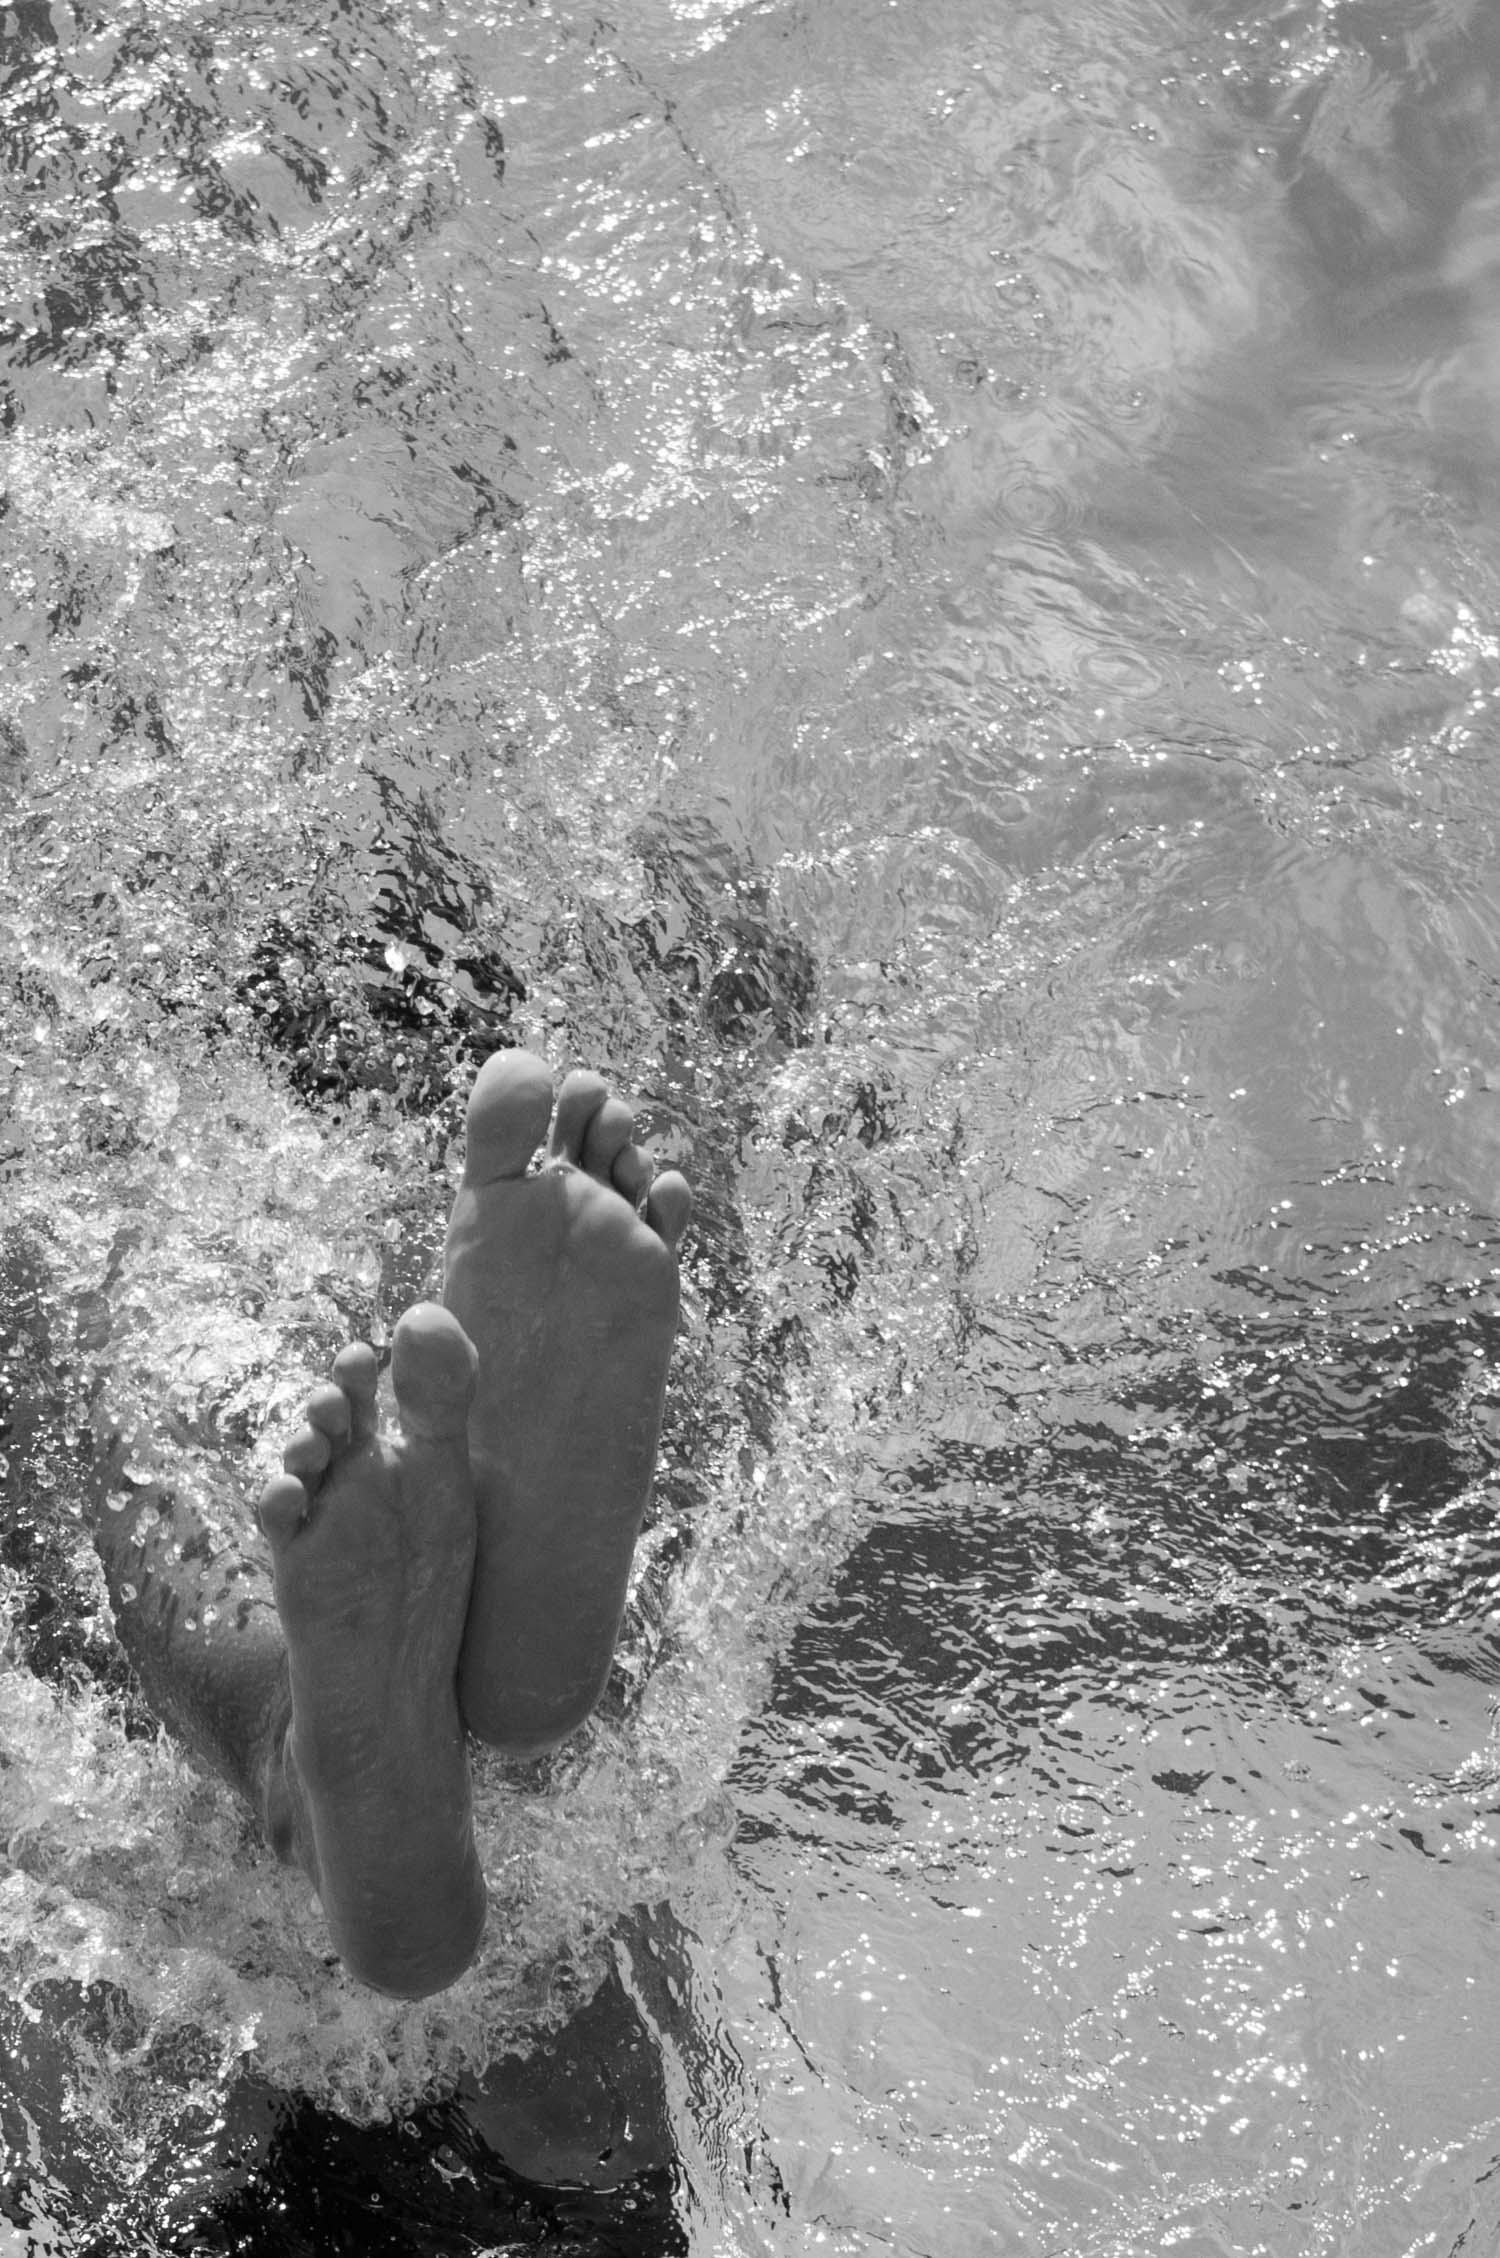 DSC_0104-5swimming shots 2.jpg